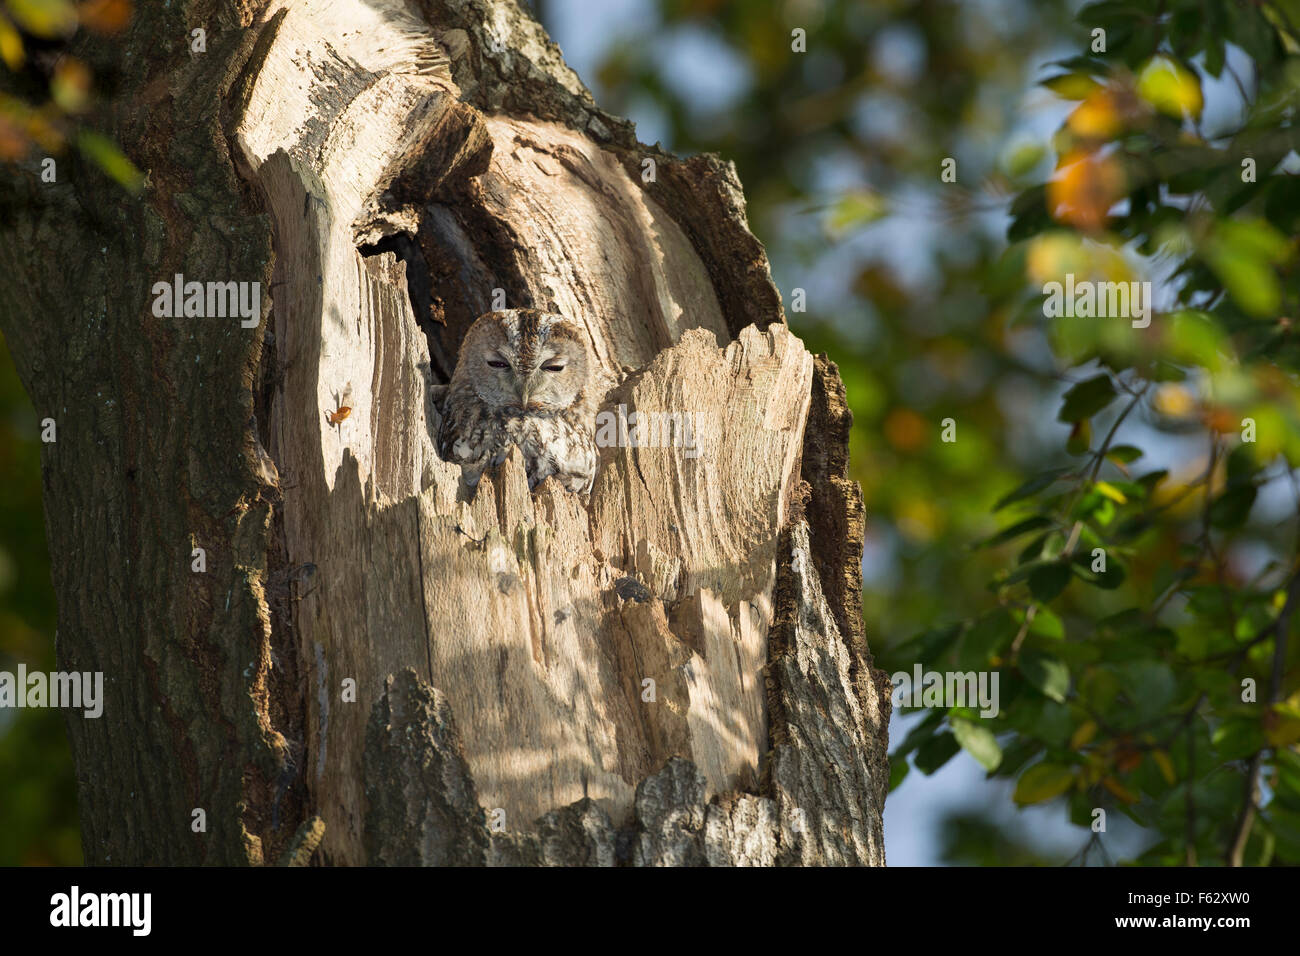 Waldkauz, Waldkauz, Ruht bin Tage in Einer Baumhöhle, Strix Aluco, Wald-Kauz, Kauz, Käuzchen Stockbild